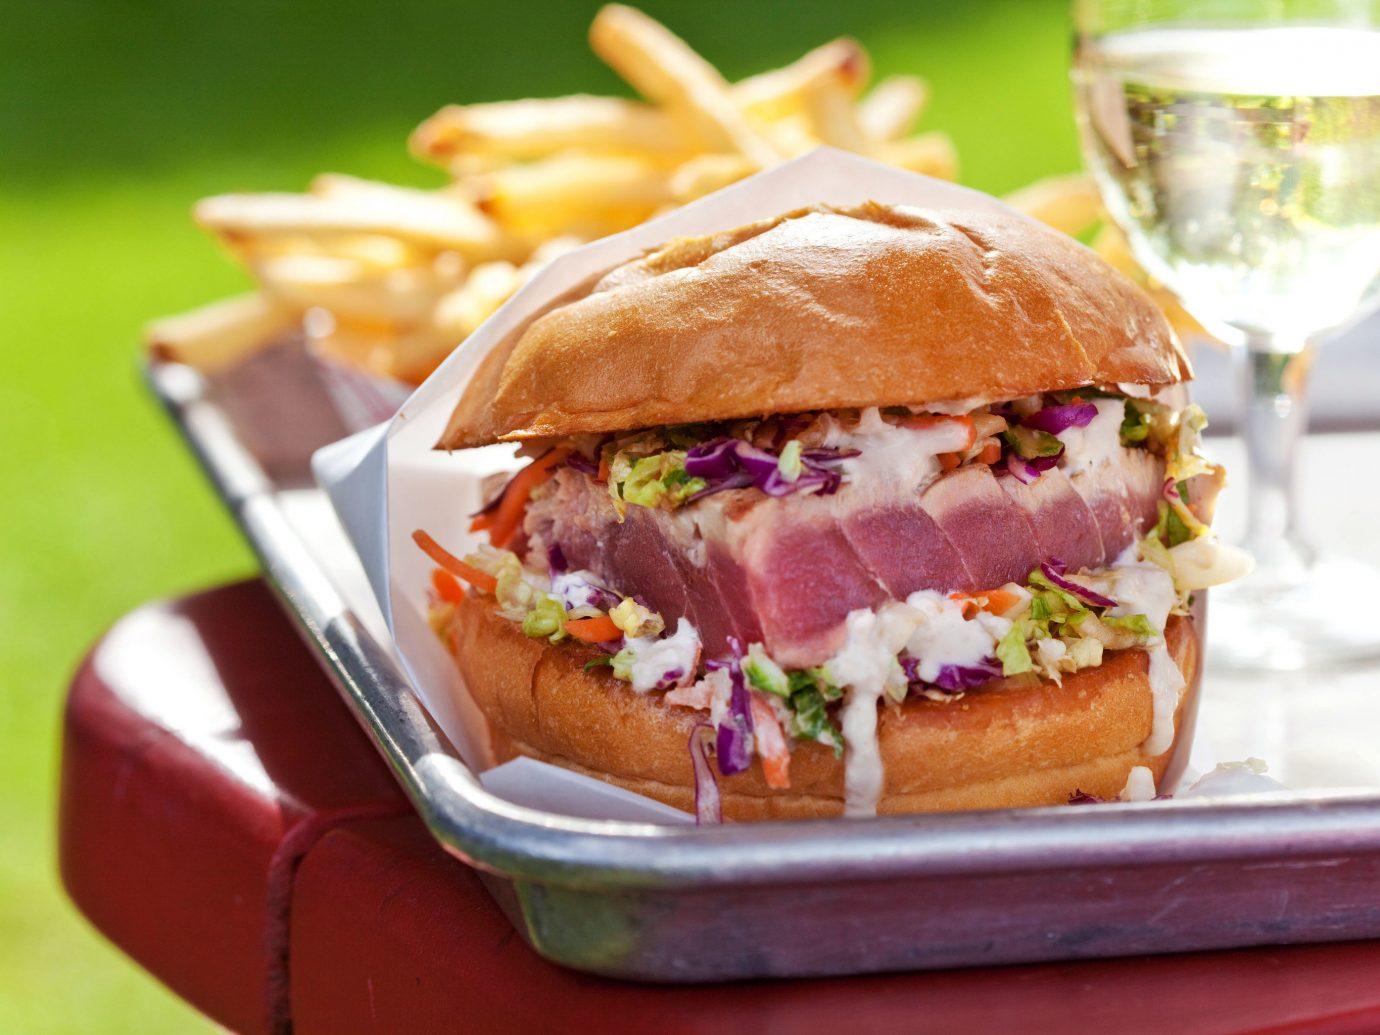 Food + Drink food dish sandwich snack food hamburger meat slider produce meal lunch cuisine breakfast fast food close